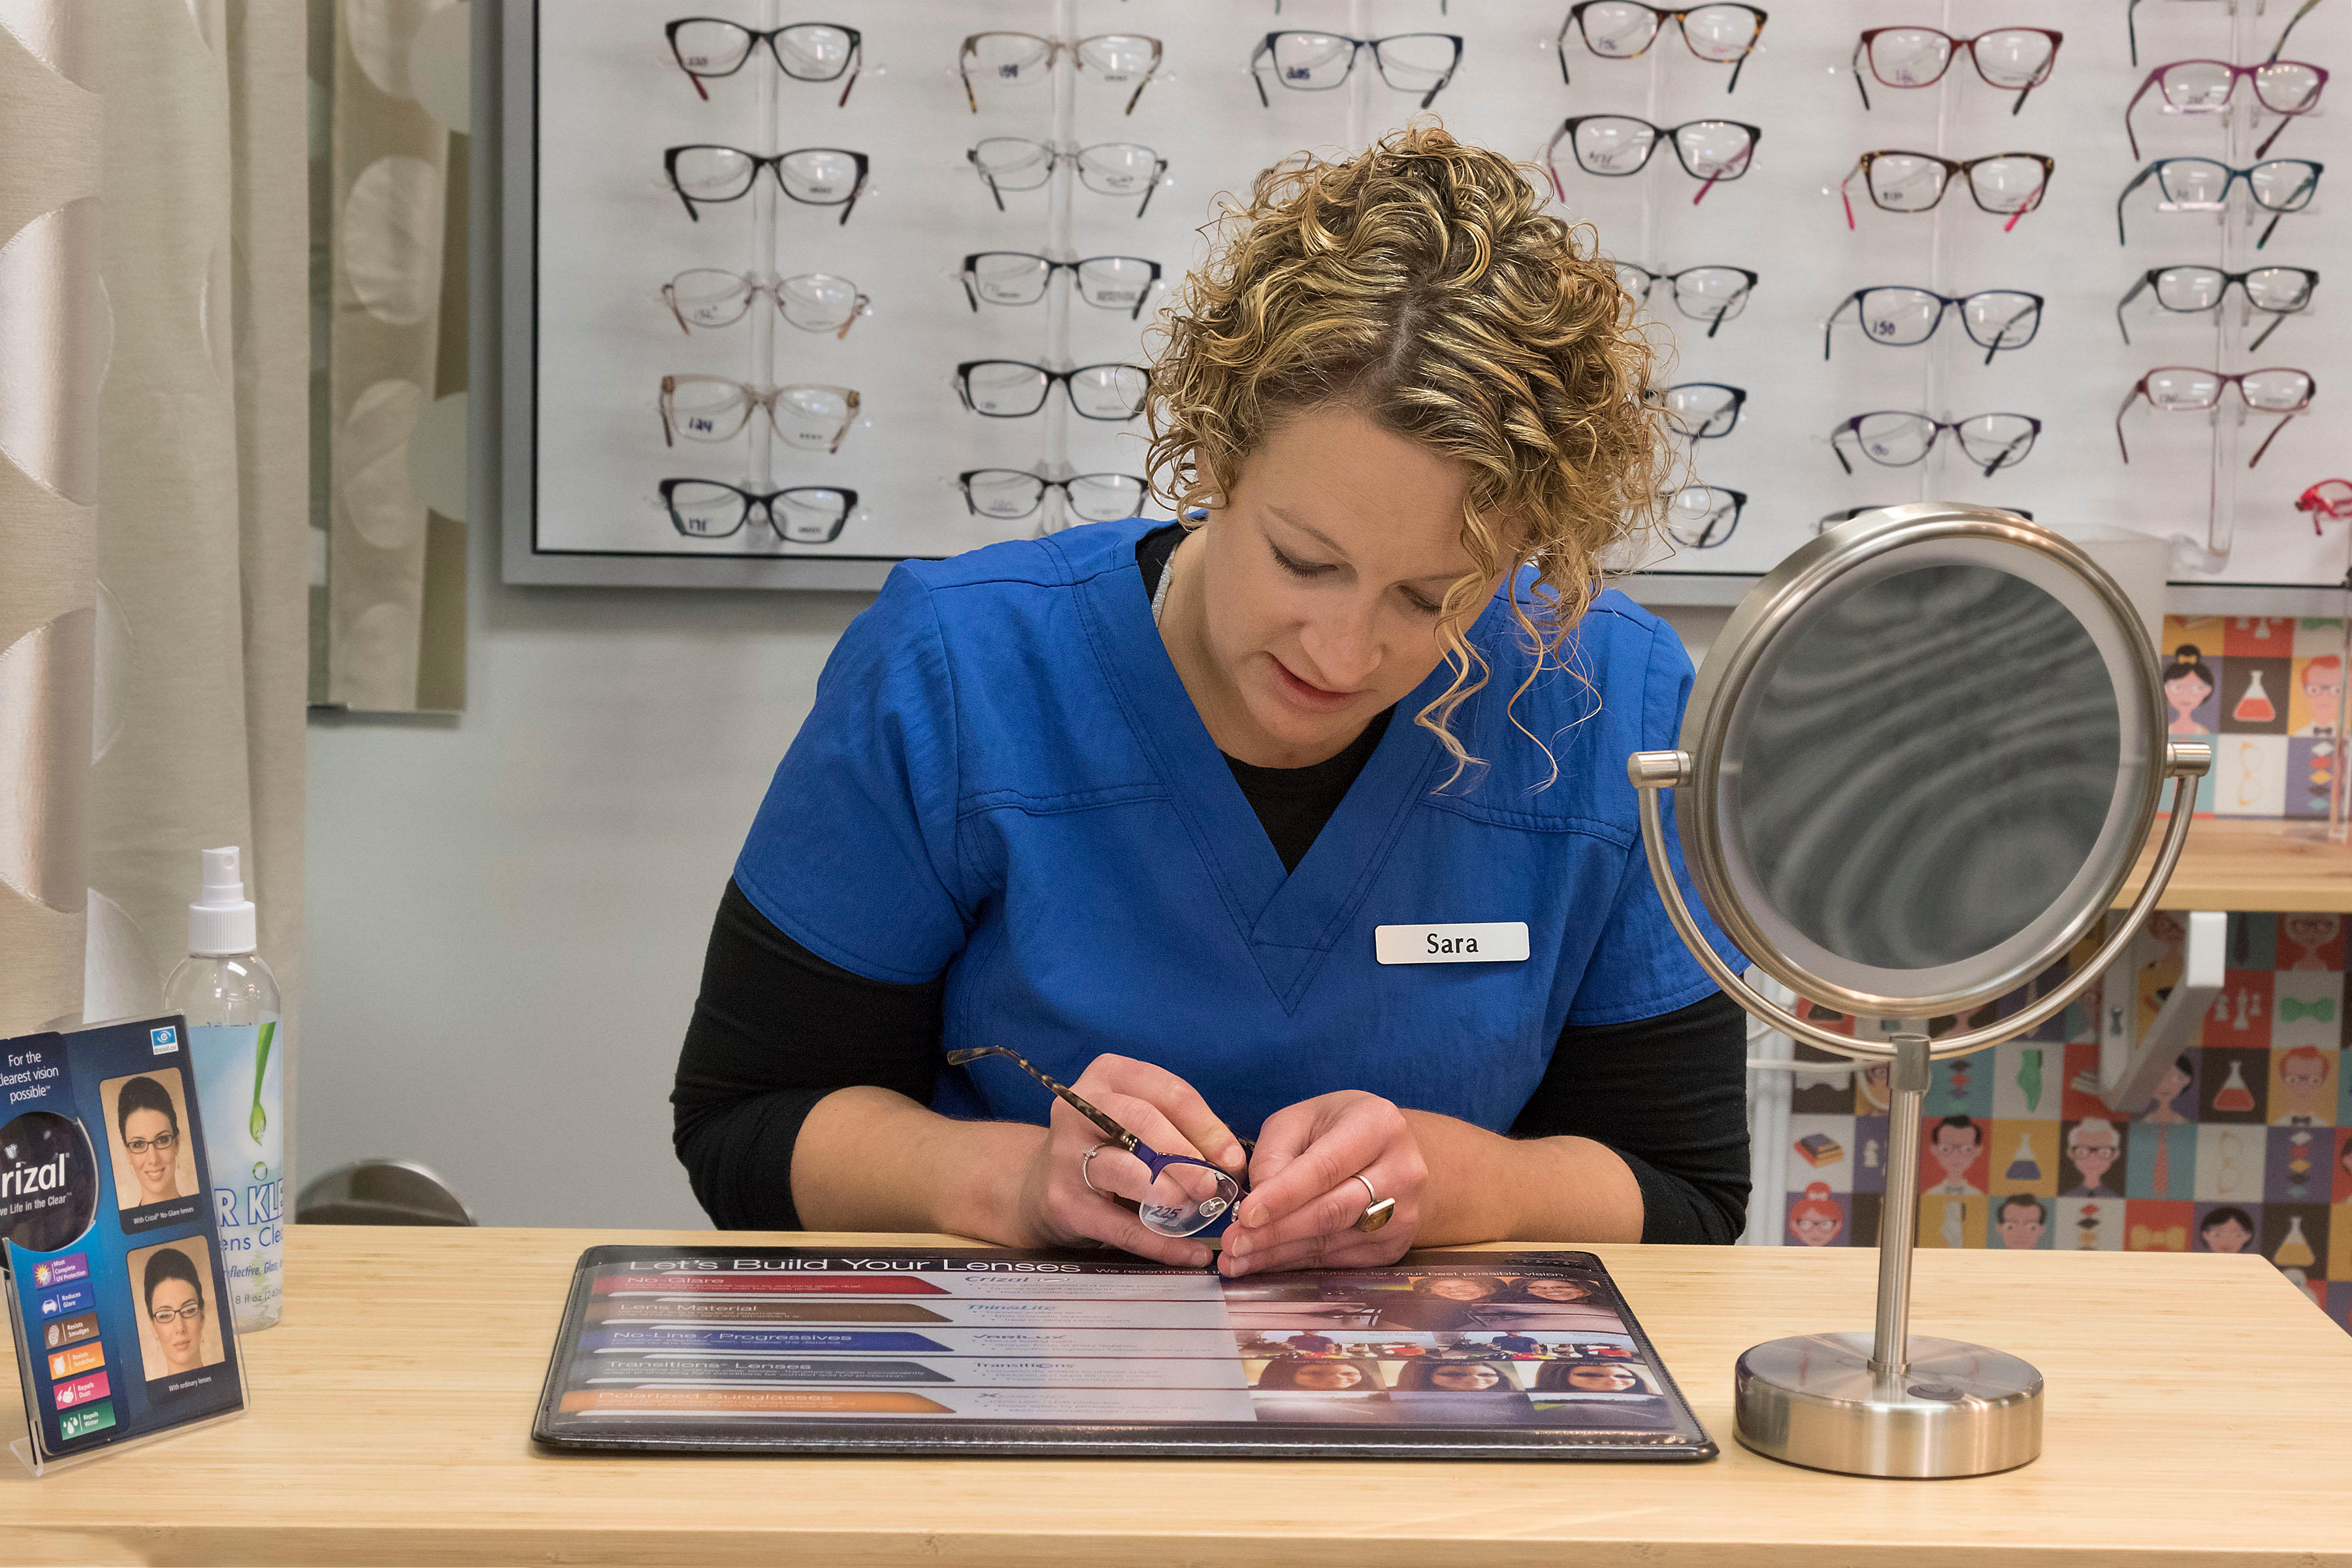 Heart of America Eye Care image 3